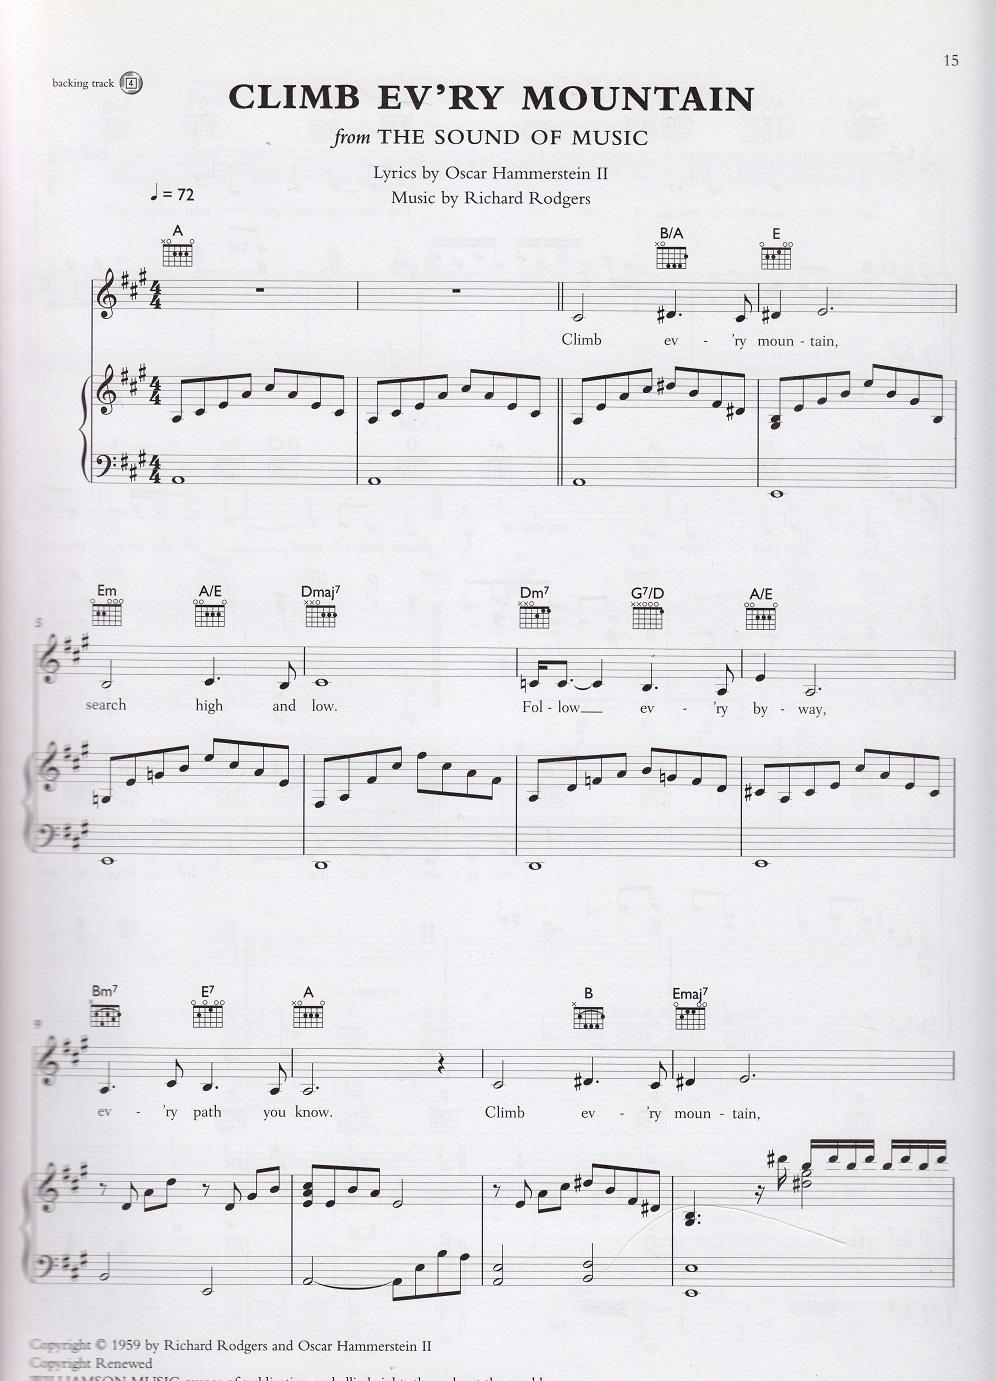 climb every mountain sheet music free pdf